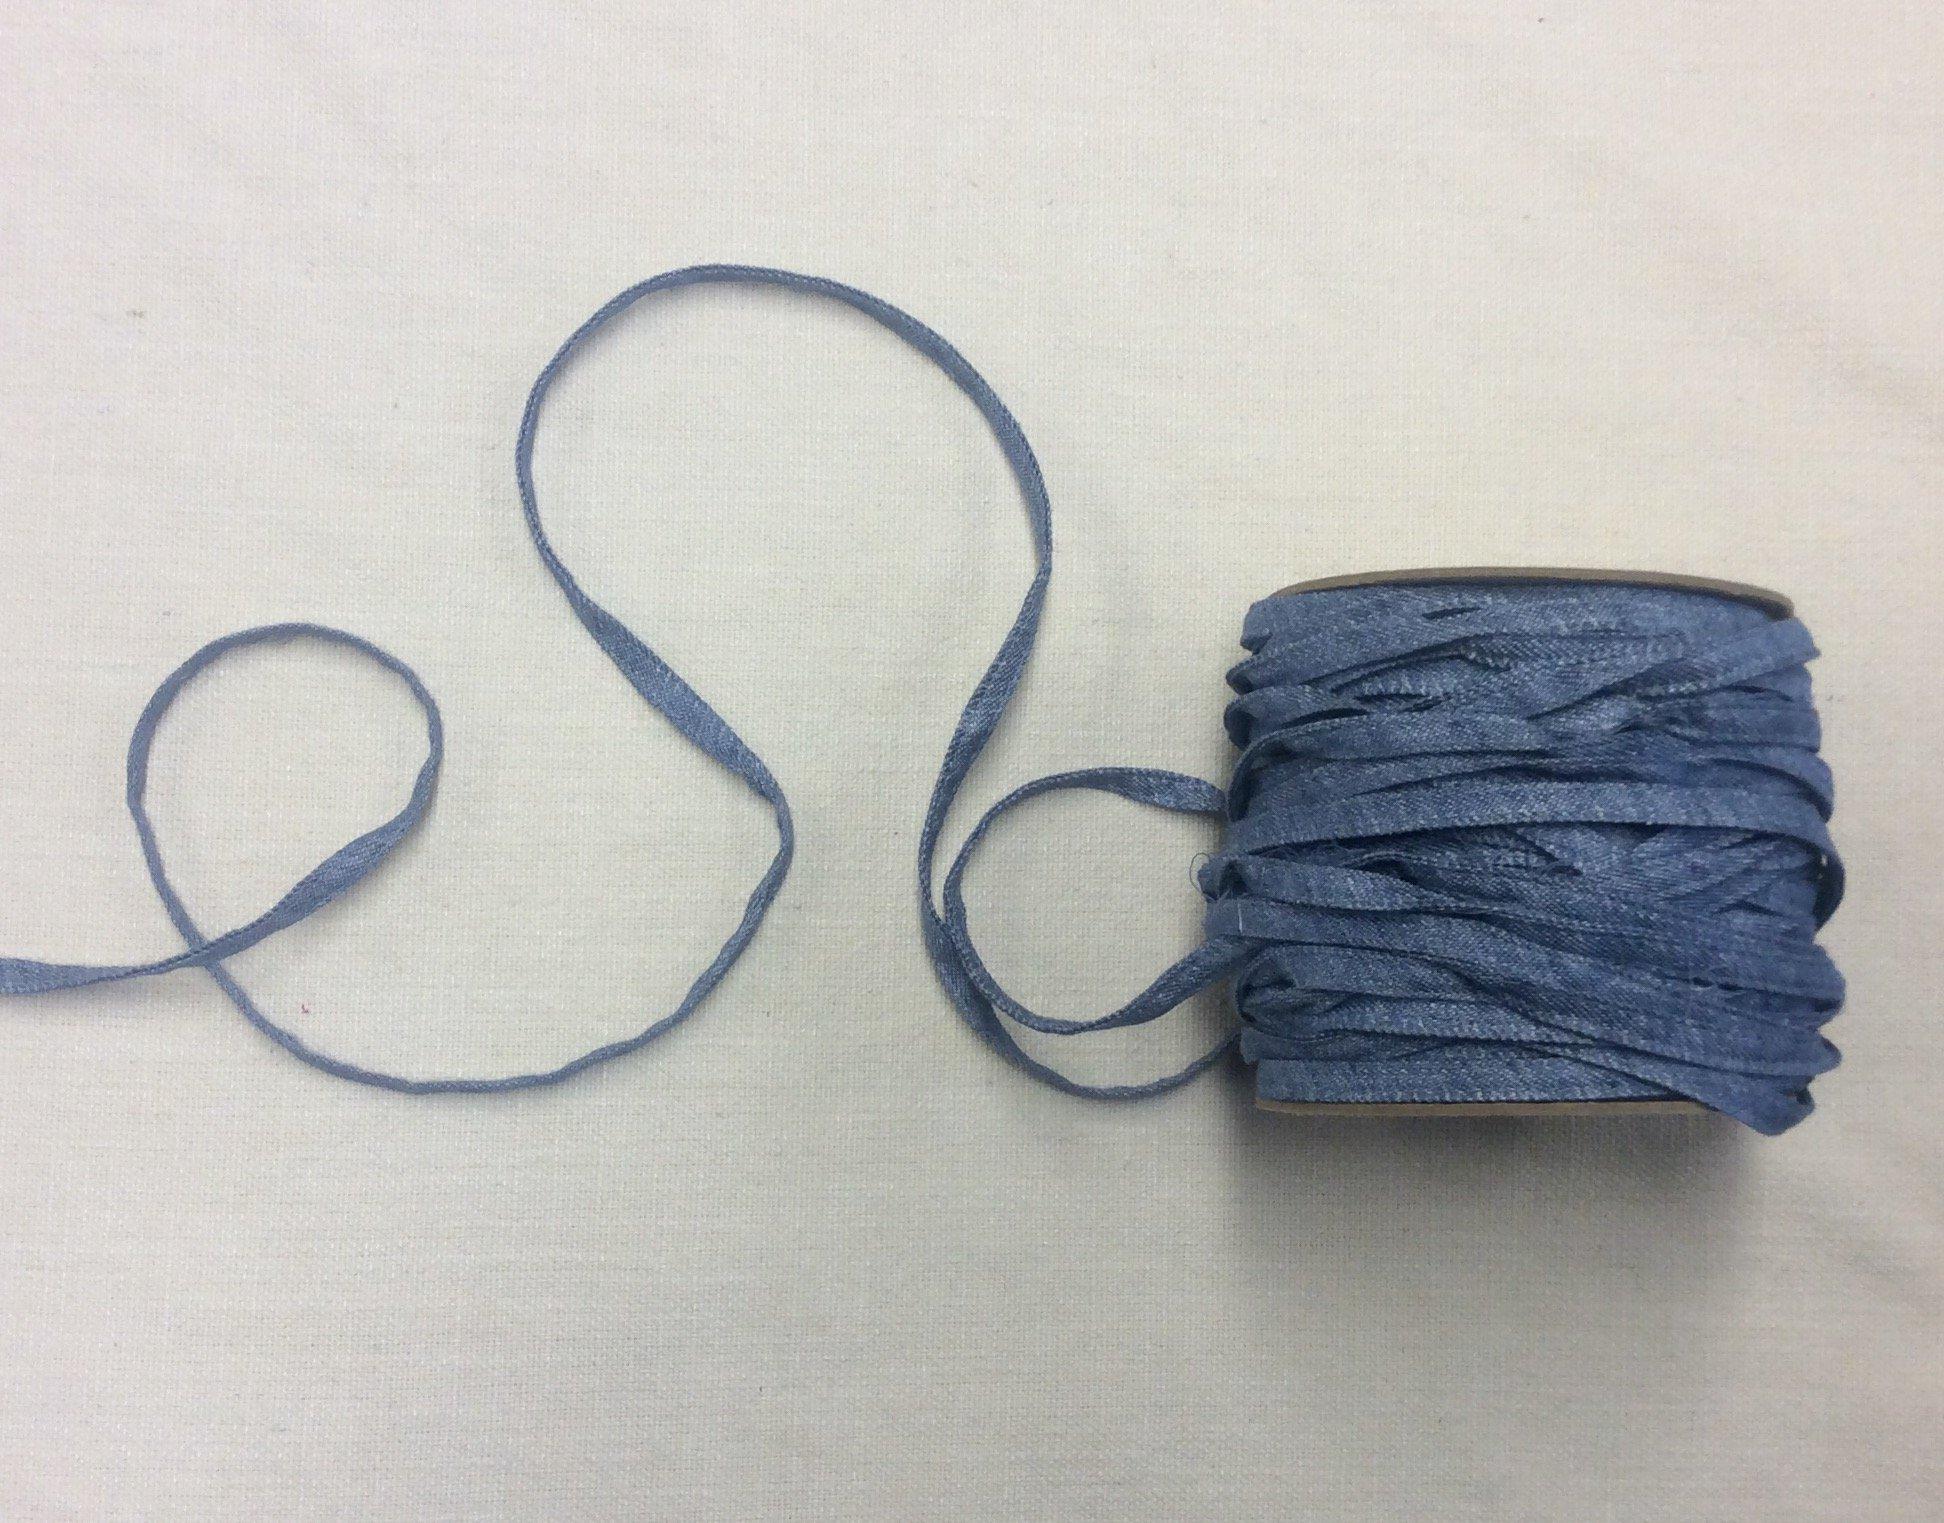 Cotton Denim Belt Loop Trim Ribbon Apparel Trim FM33757